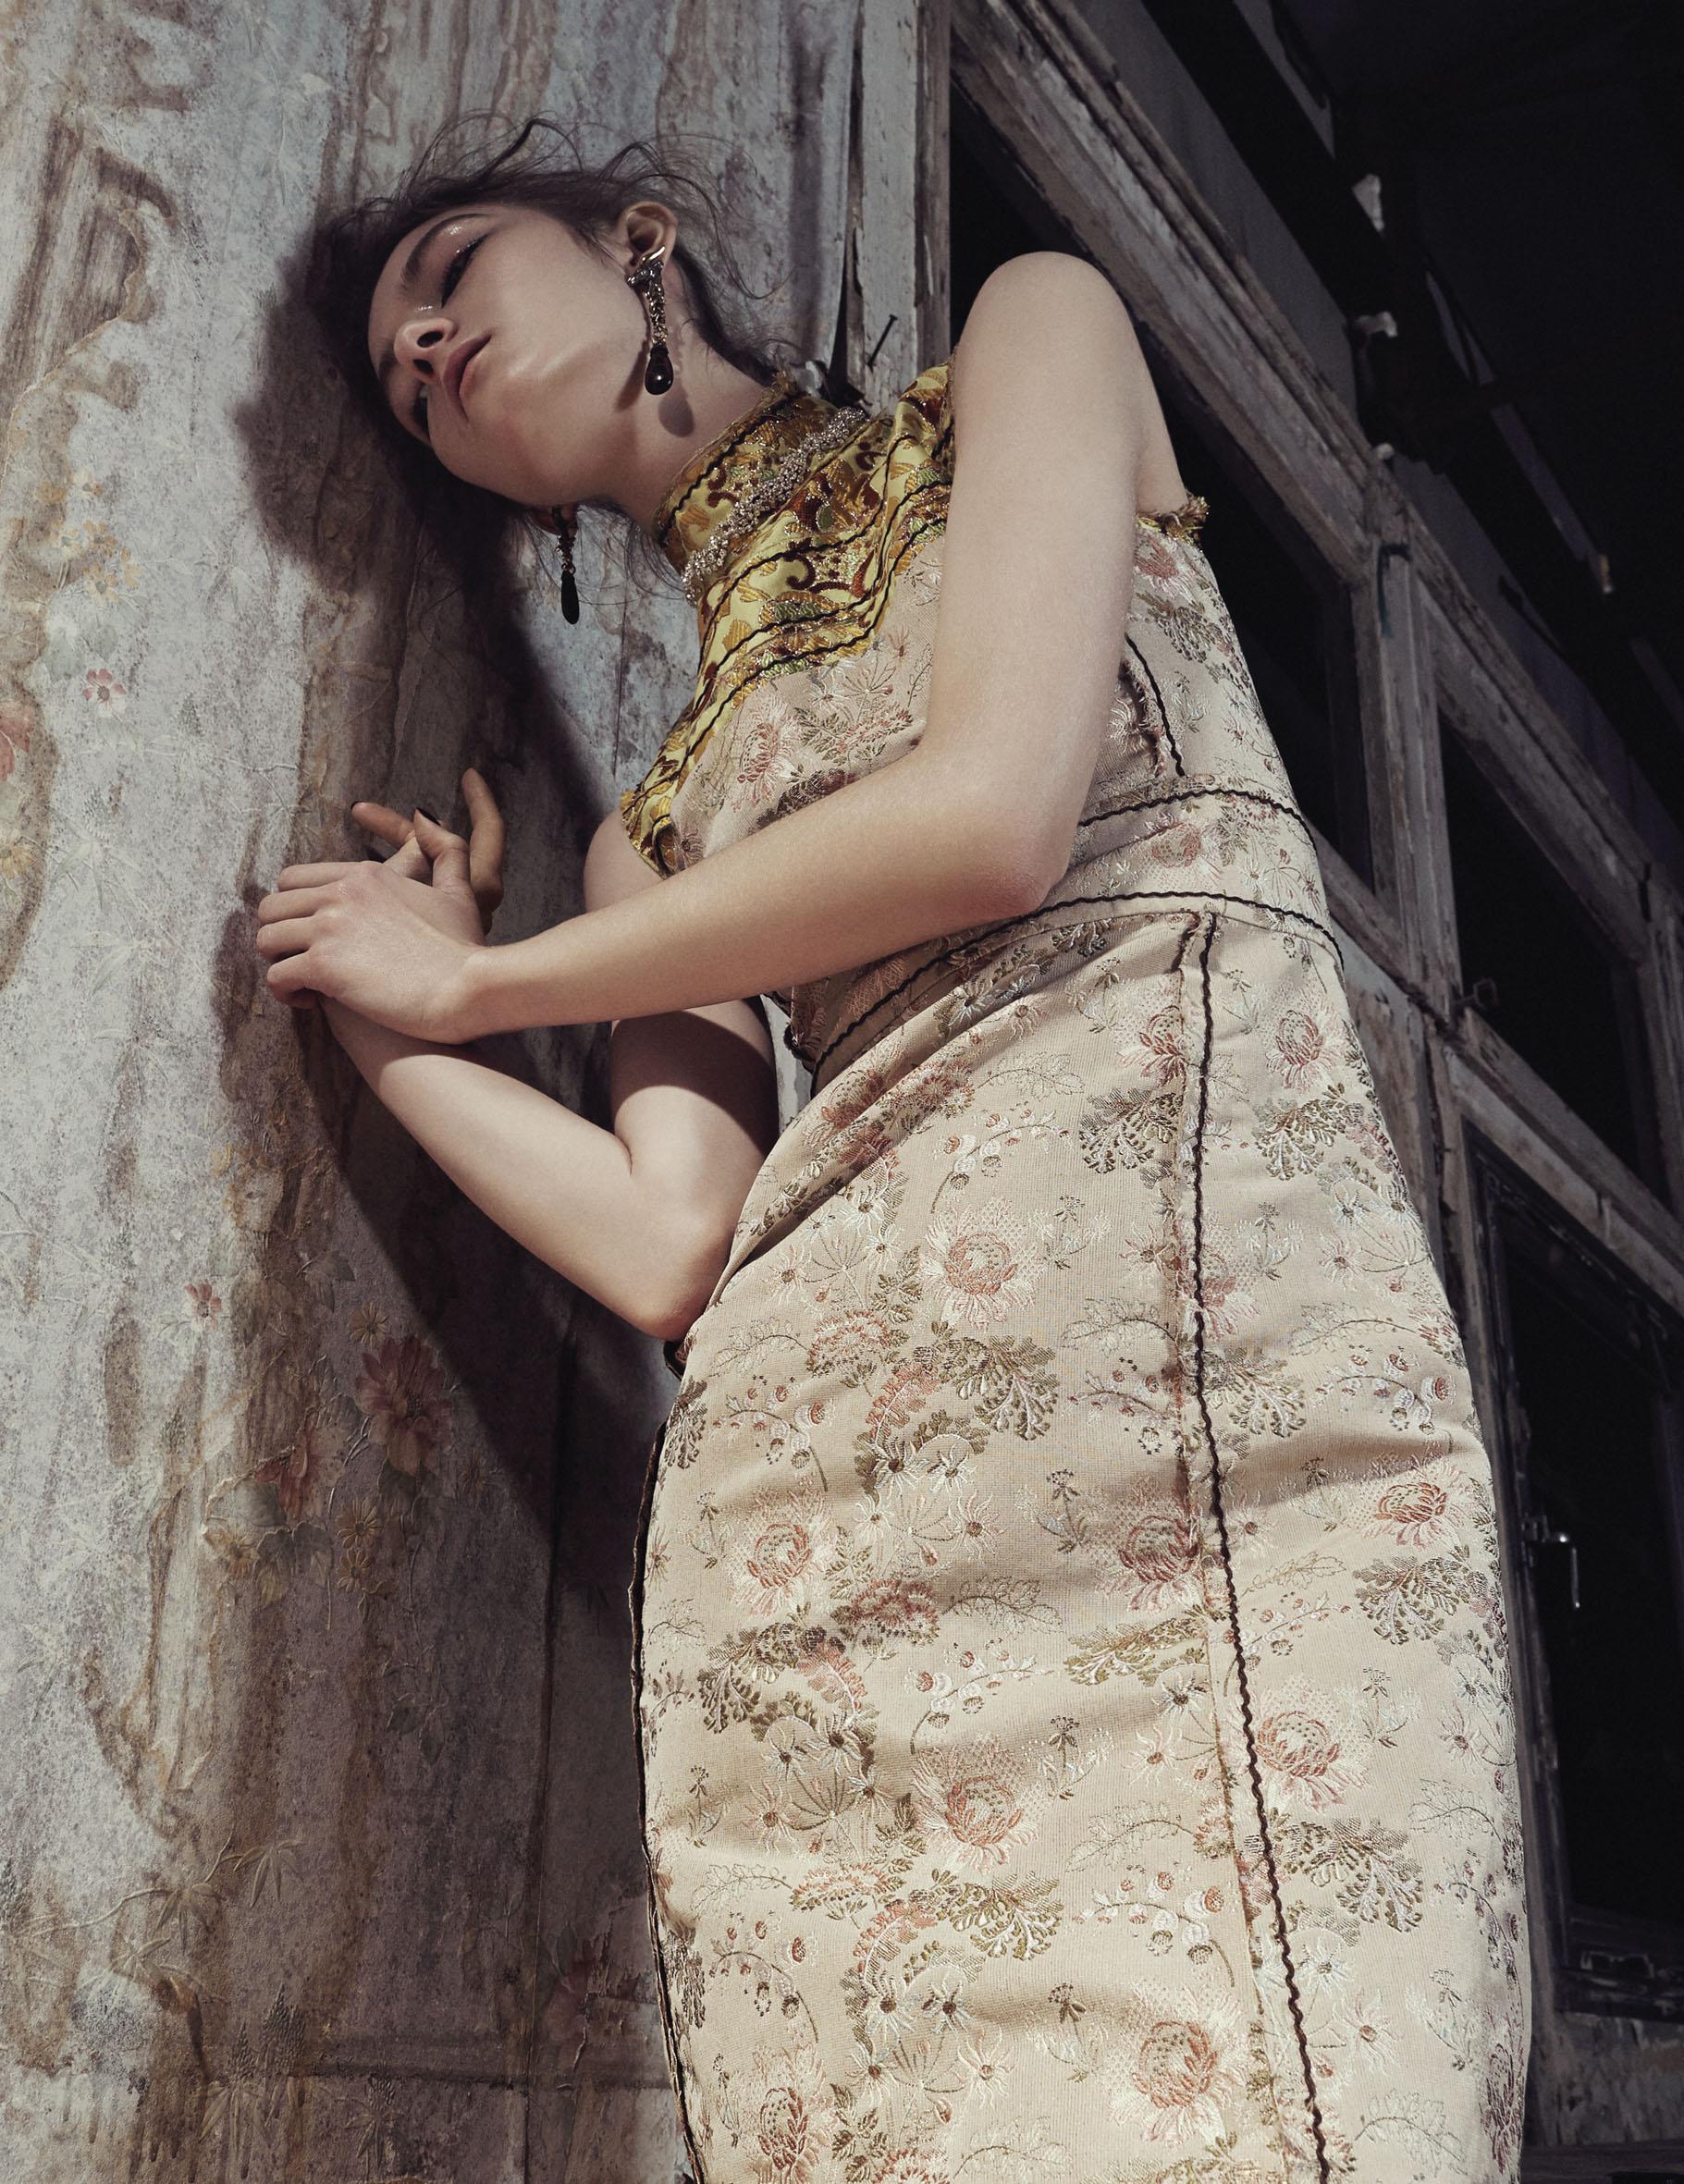 10 Magazine SS 2015 issue | Alessio Bolzoni | 10 Magazine | Hector Castro | Numerique Retouch Photo Retouching Studio